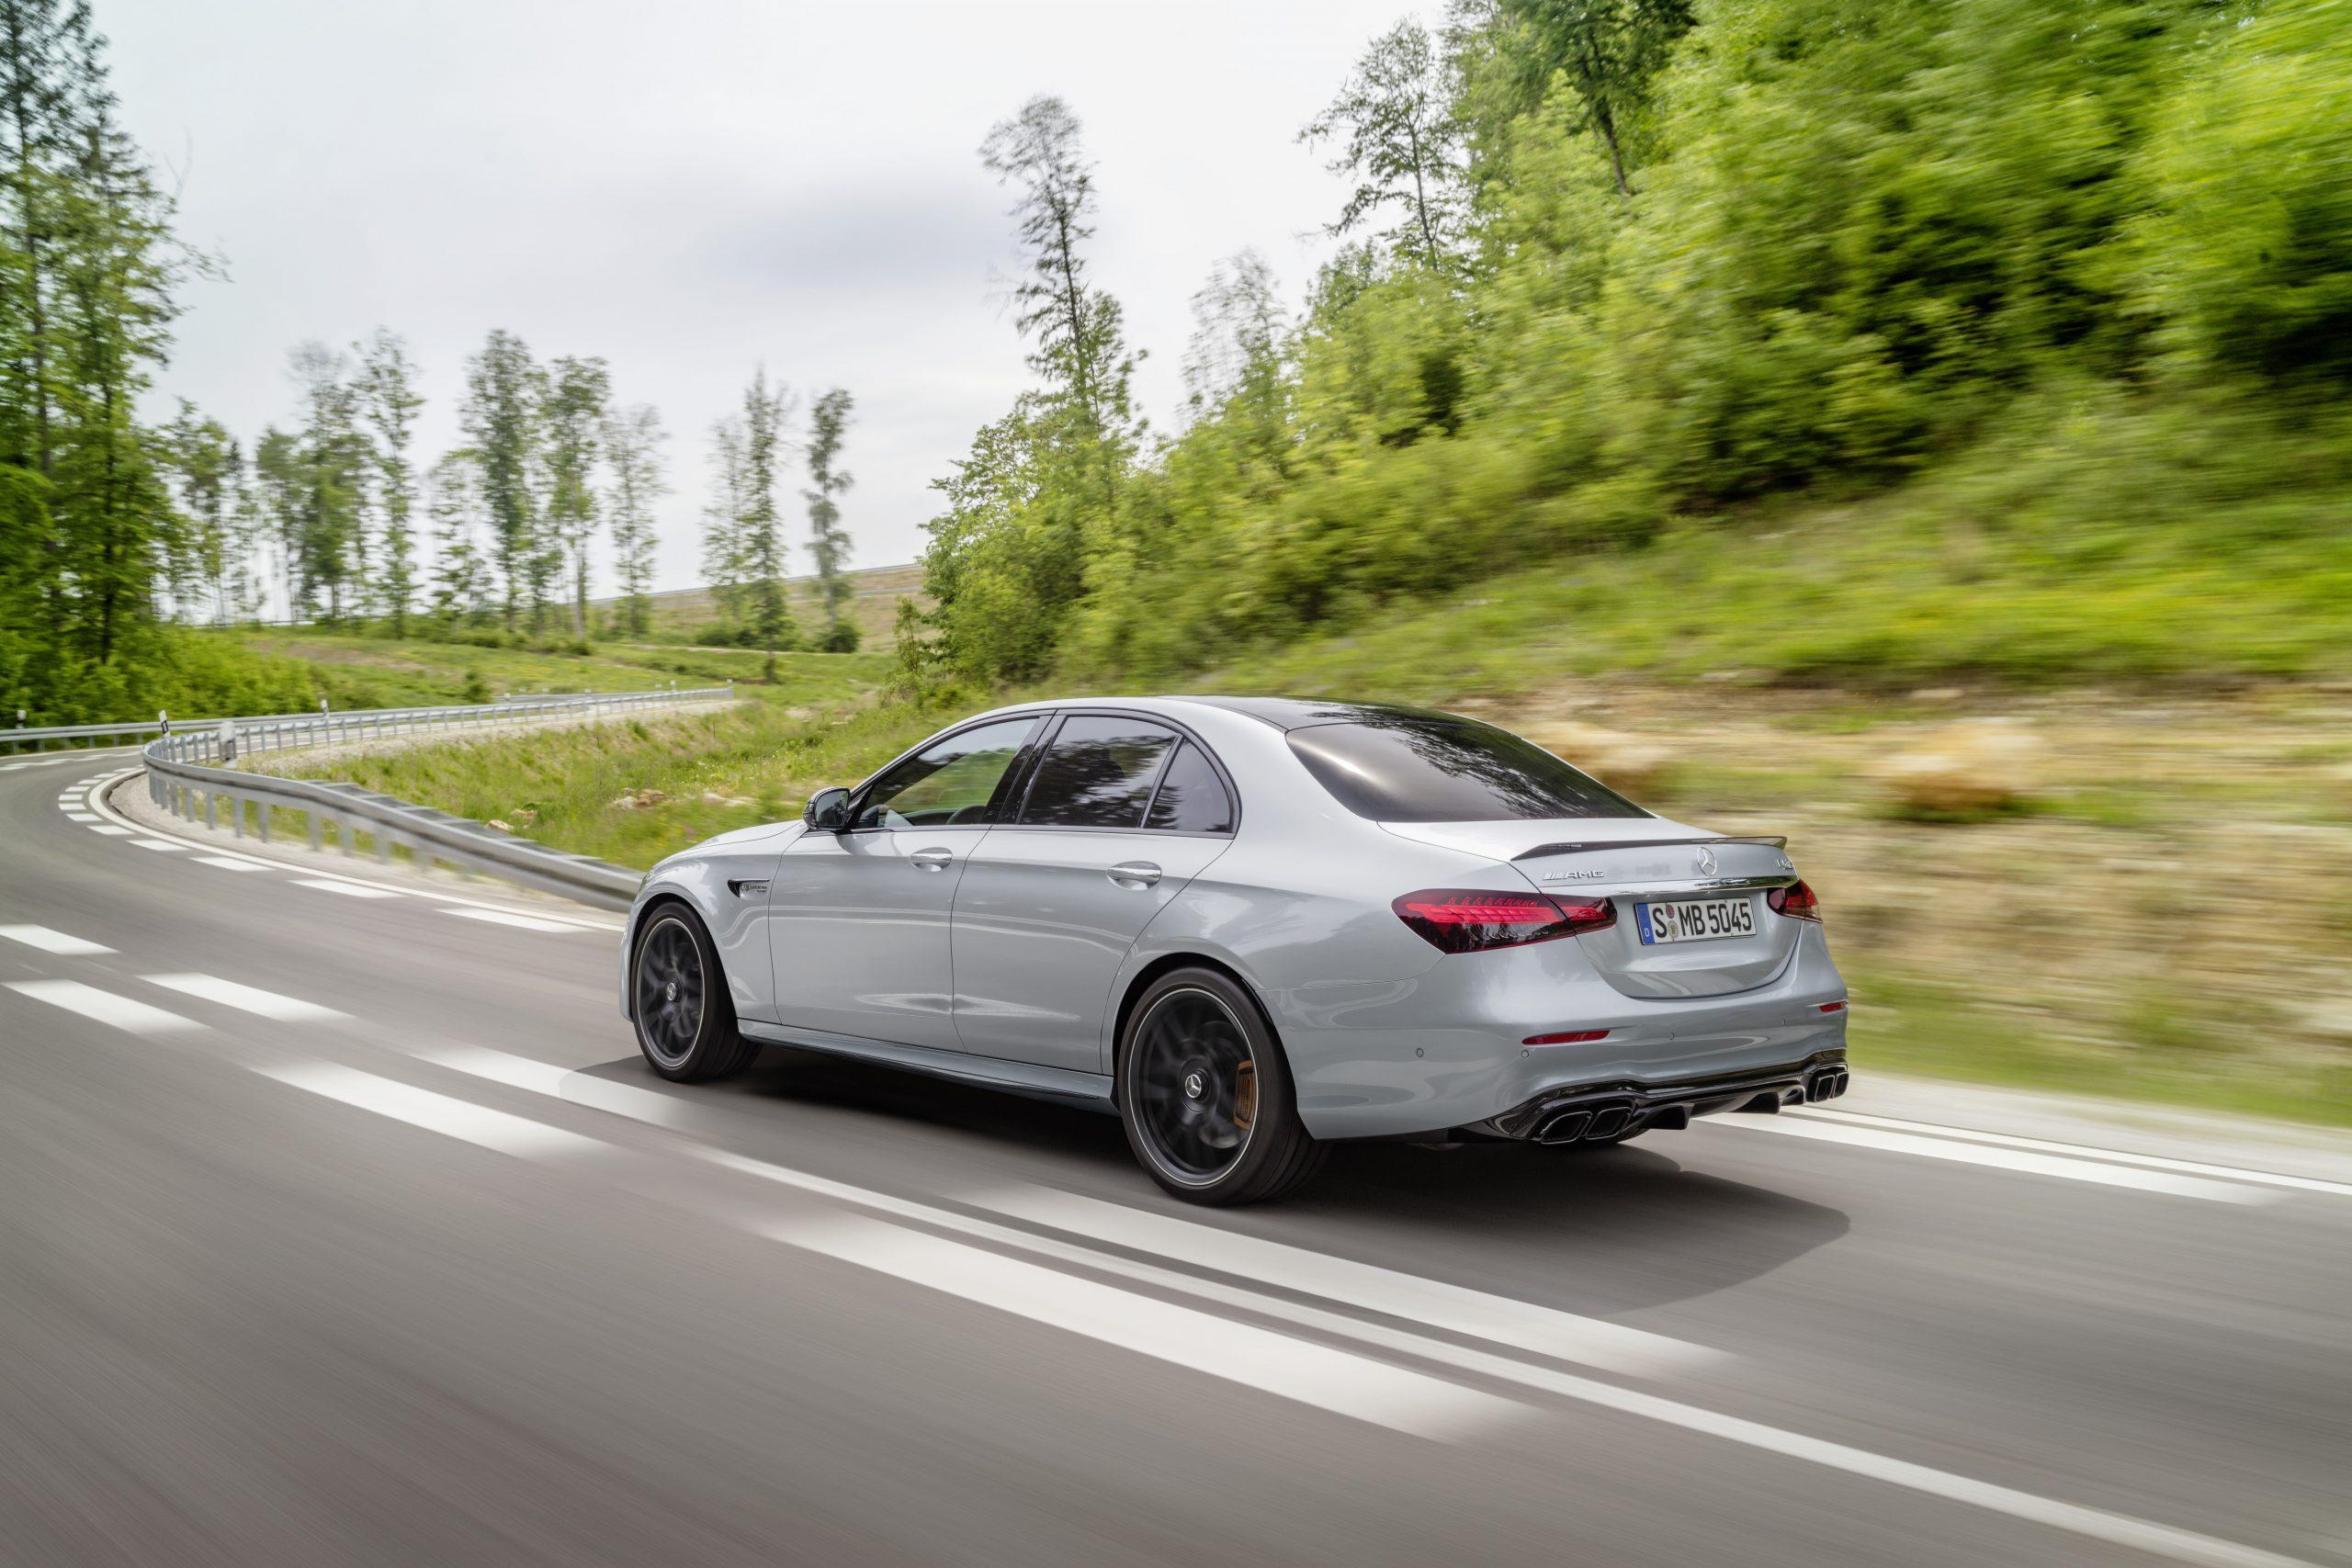 2021 Mercedes-AMG E63 S sedan rear three quarter